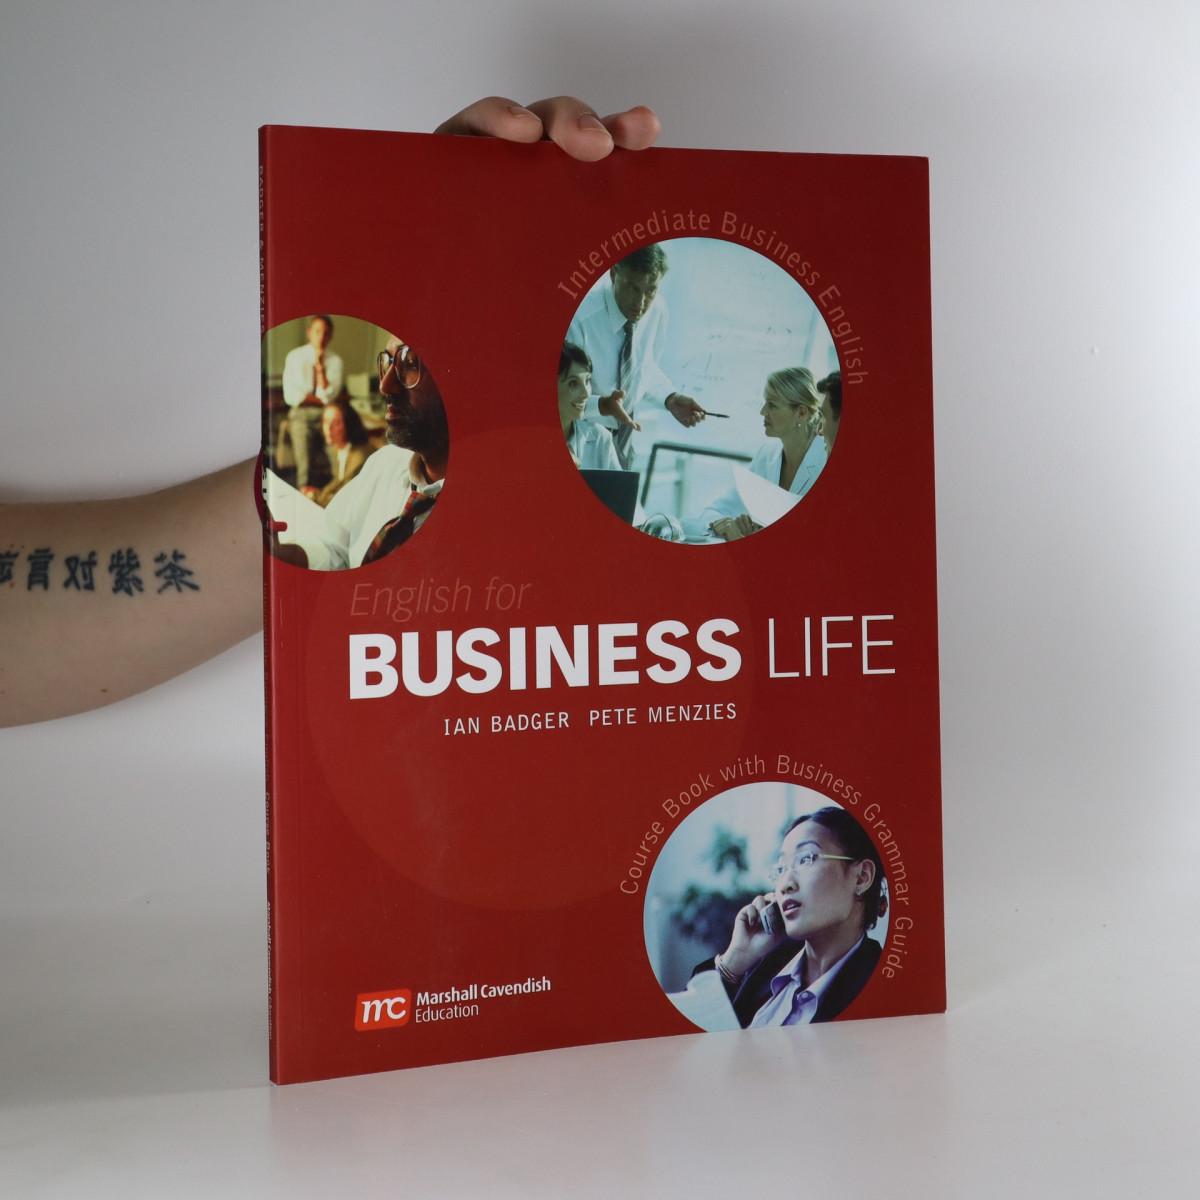 antikvární kniha English for business life; Intermediate business English, neuveden